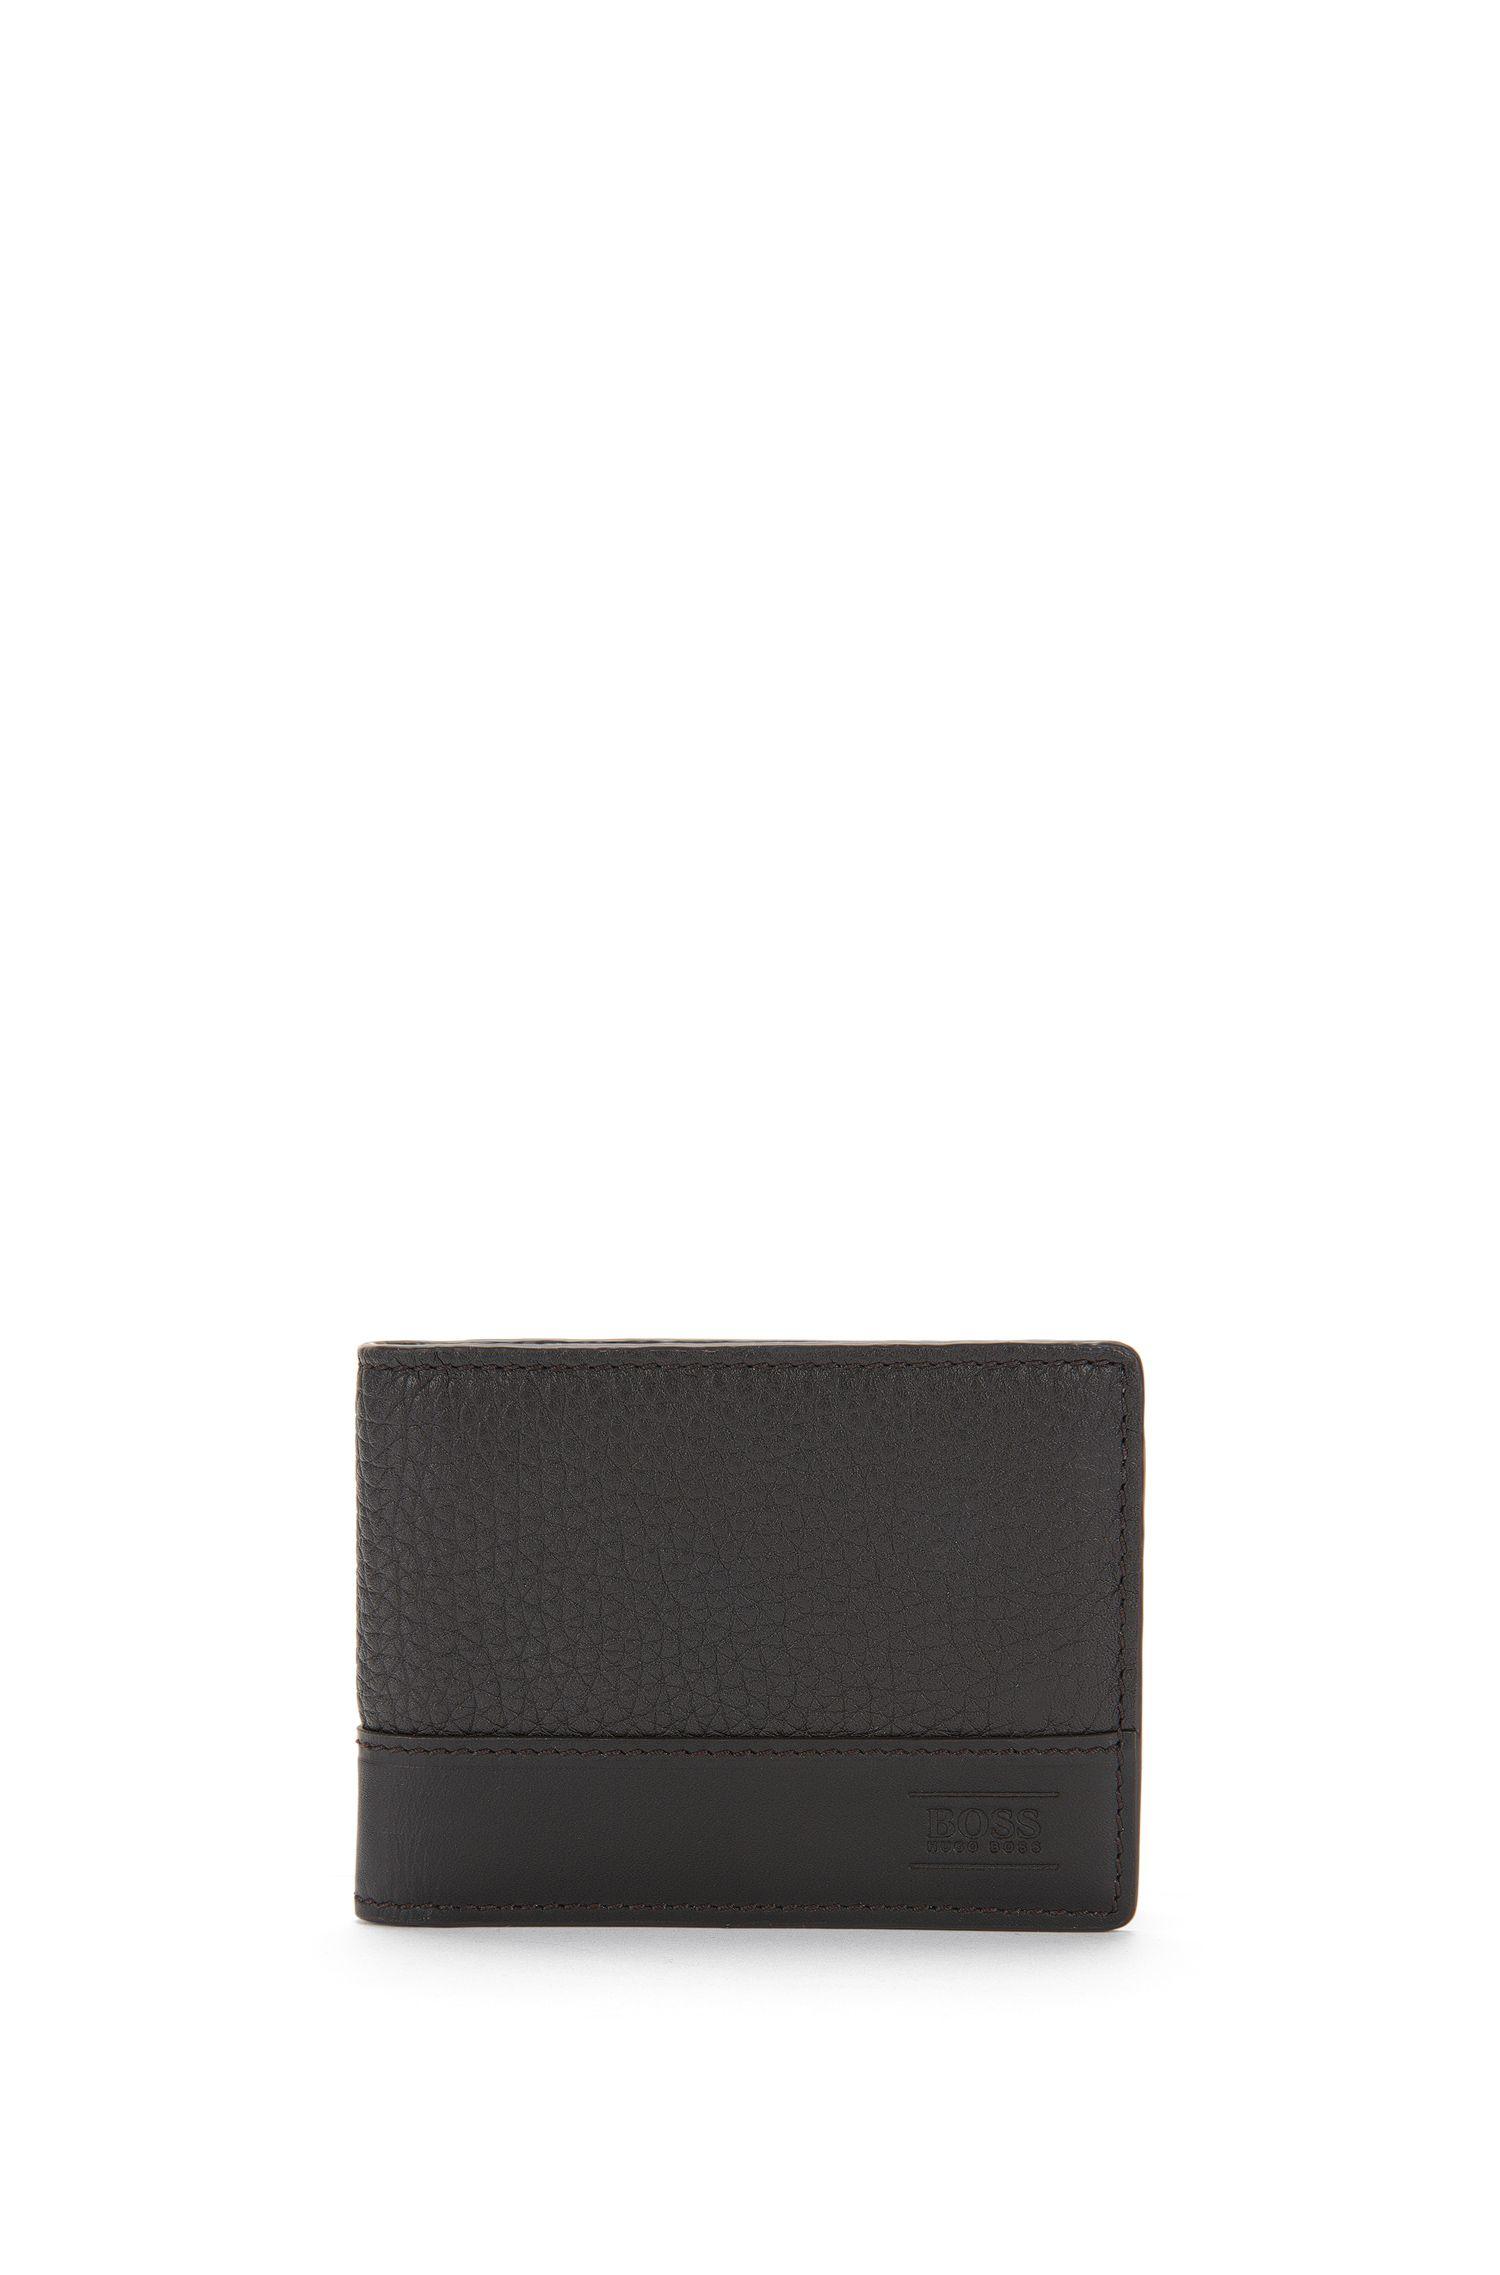 'Aspen 6 CC' | Textured Leather Wallet